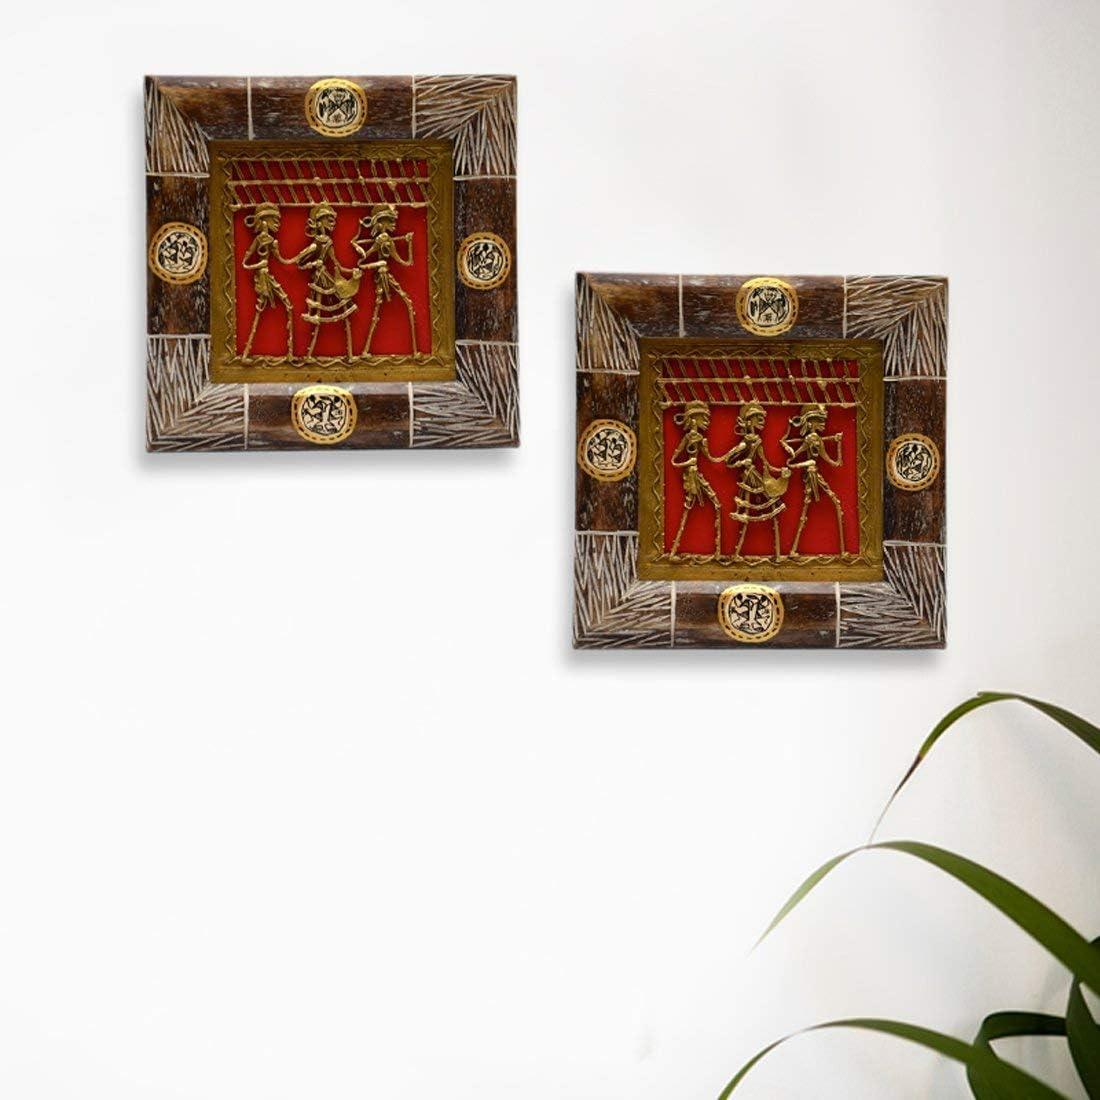 NAAYA'S DECOR Dhokra Work and Warli Hanpainted Sheesham Wooden Home Decorative Wall Hanging Cum Wall Decor Set